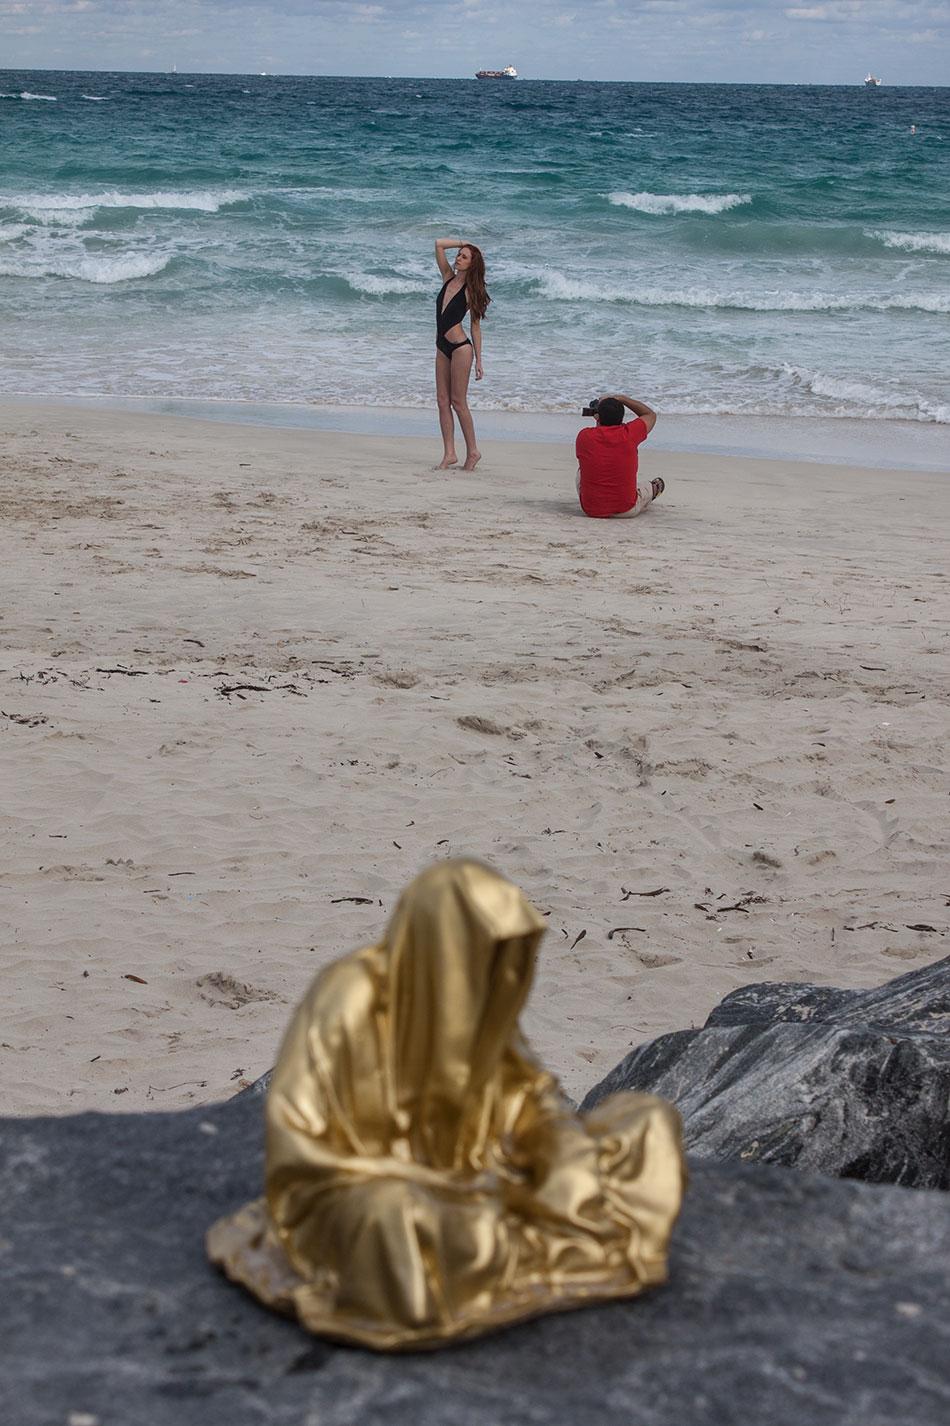 public-art-basel-miami-beach-fair-usa-florida-guardians-of-time-manfred-kili-kielnhofer-contemporary-fine-art-modern-arts-design-antiques-sculpture-6861